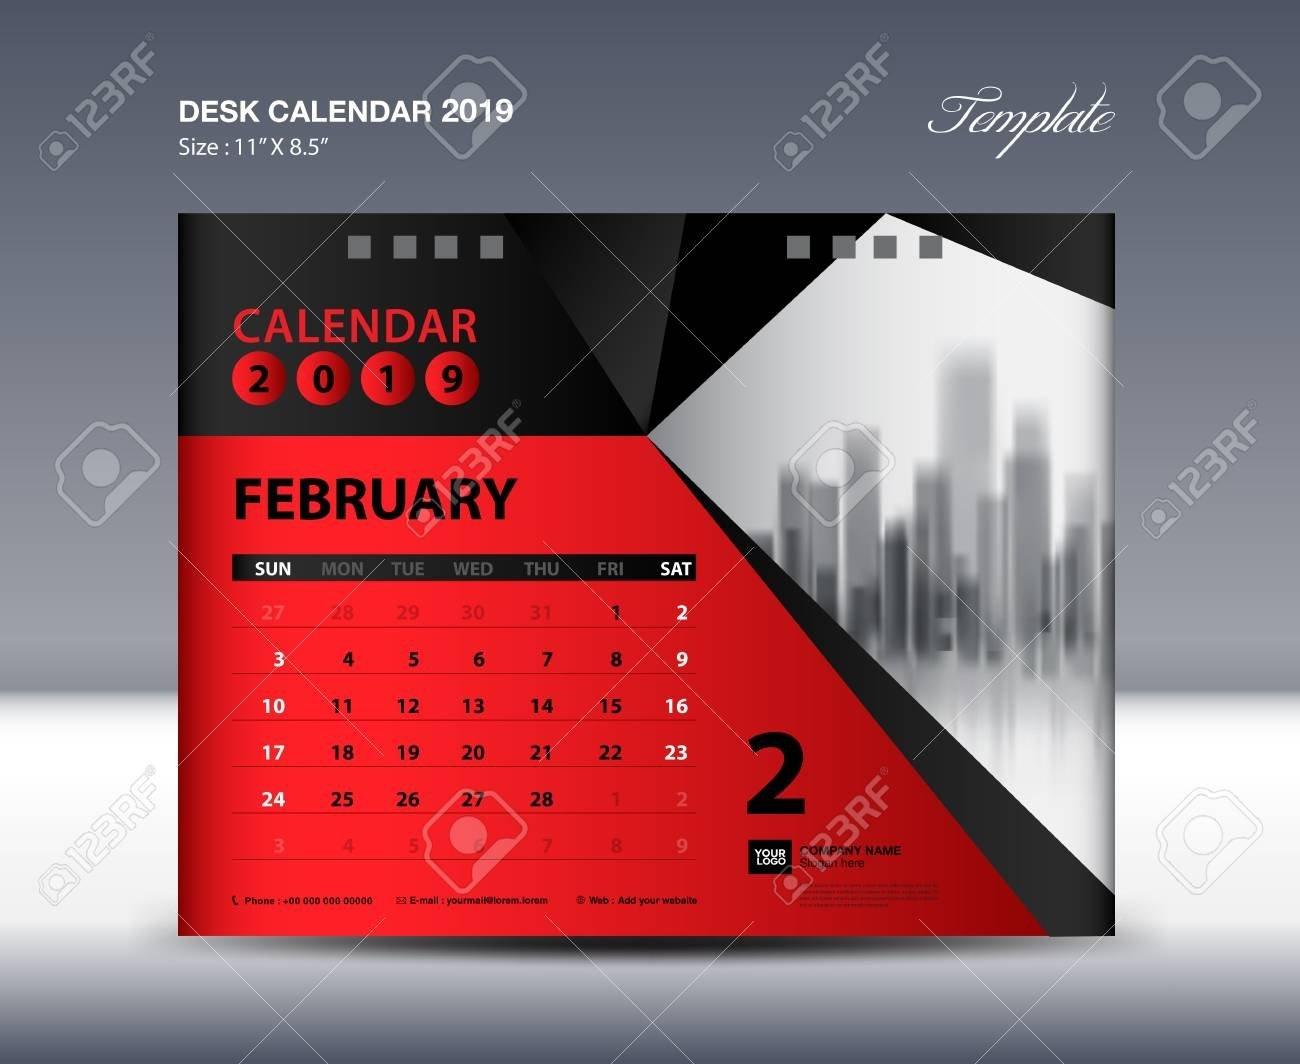 February Desk Calendar 2019 Template, Week Starts Sunday, Stationery X Files Calendar 2019